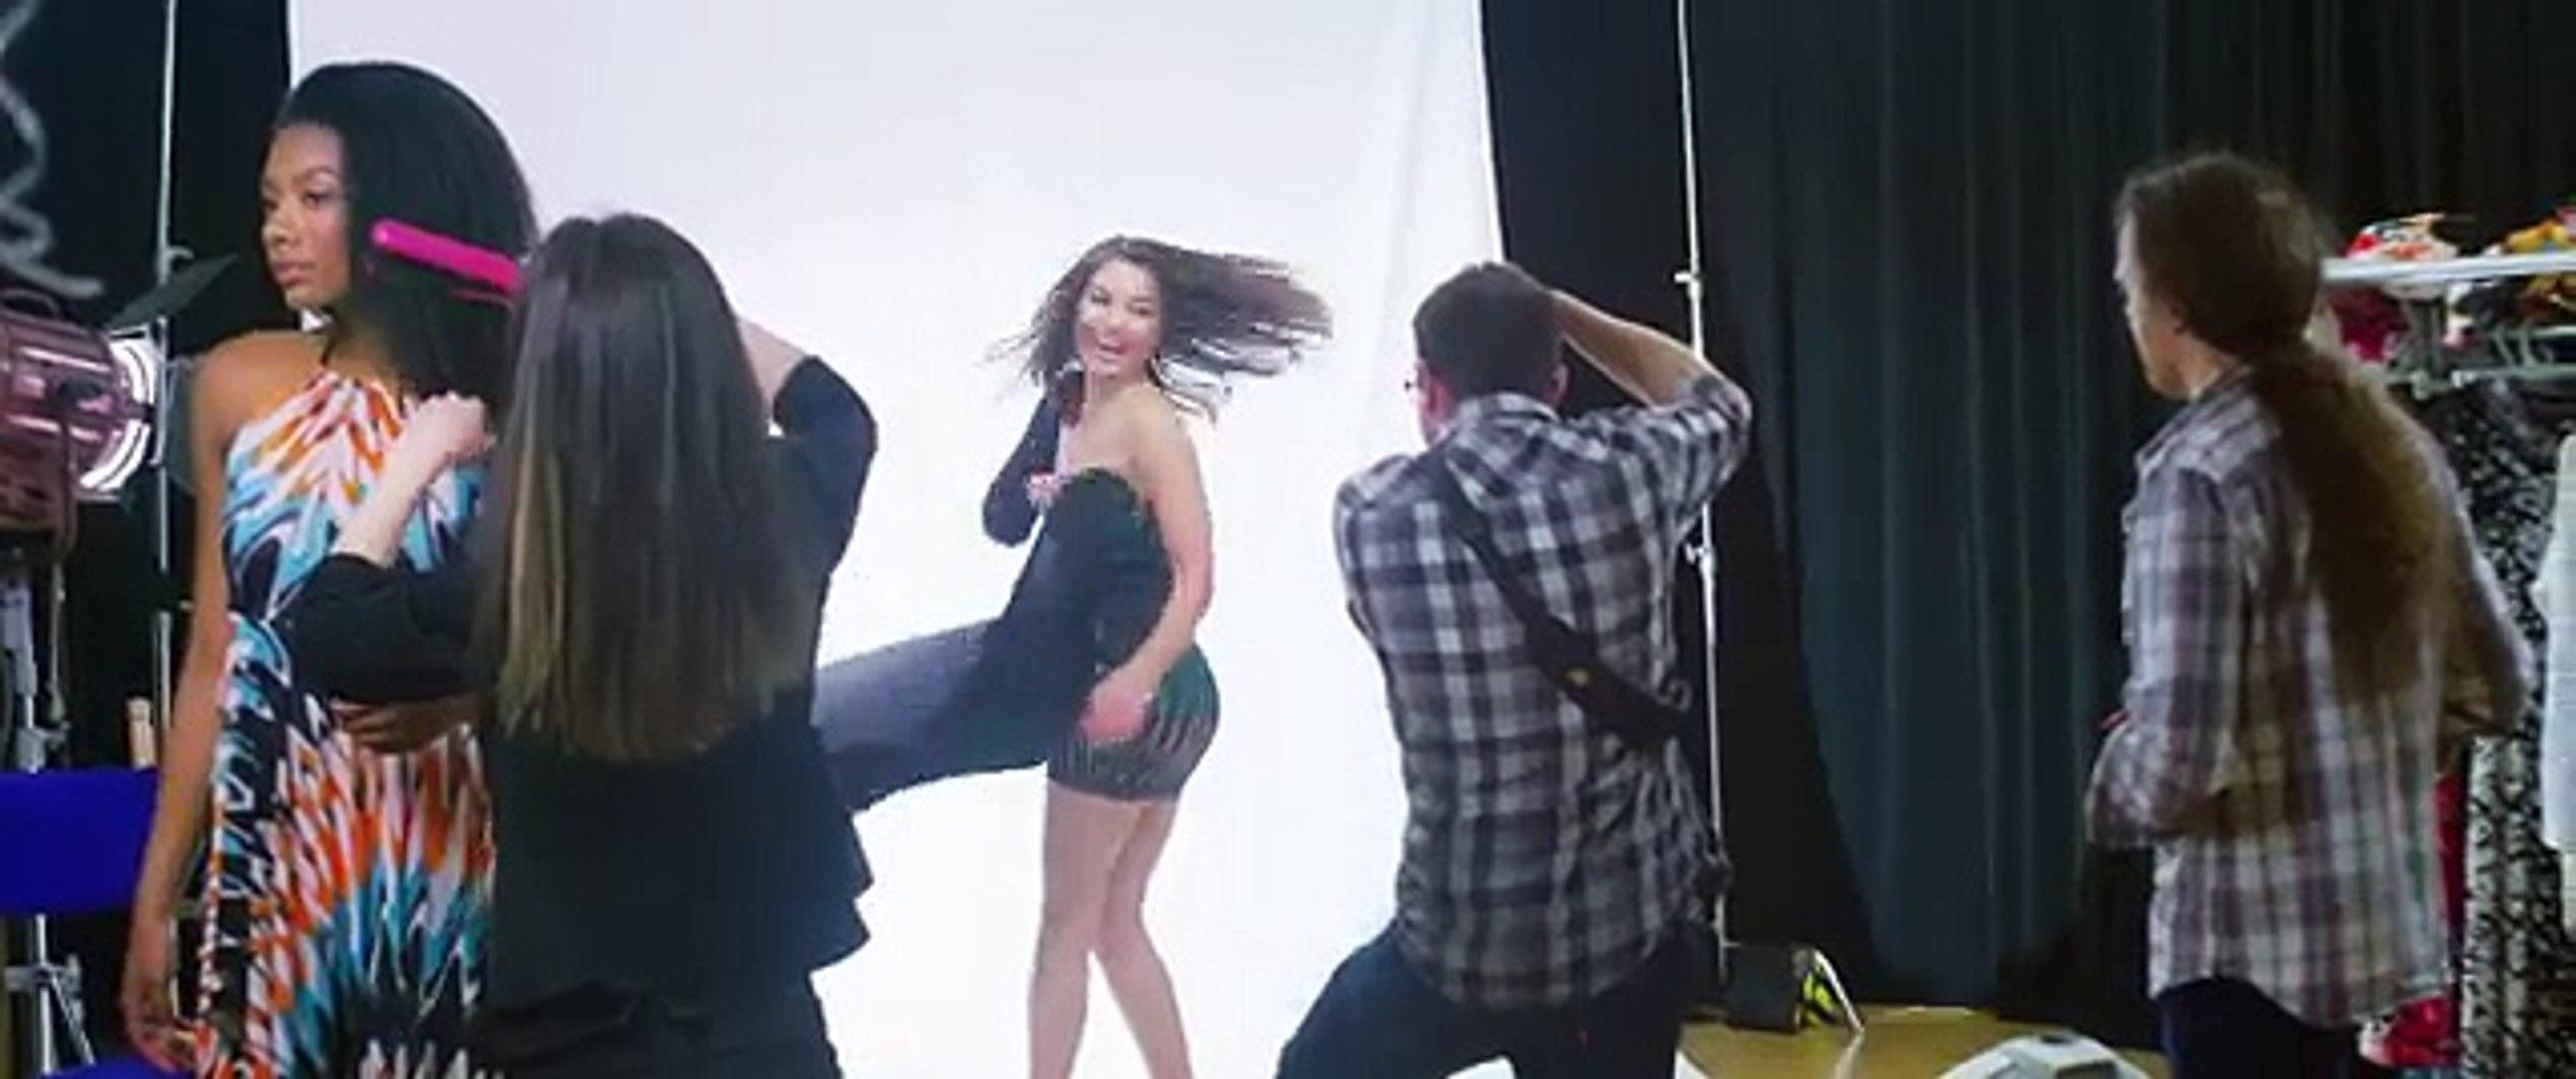 LORI LKC Collection - Fashion & Beauty - Fashion Trends 2017 - Fashion Video Shoot